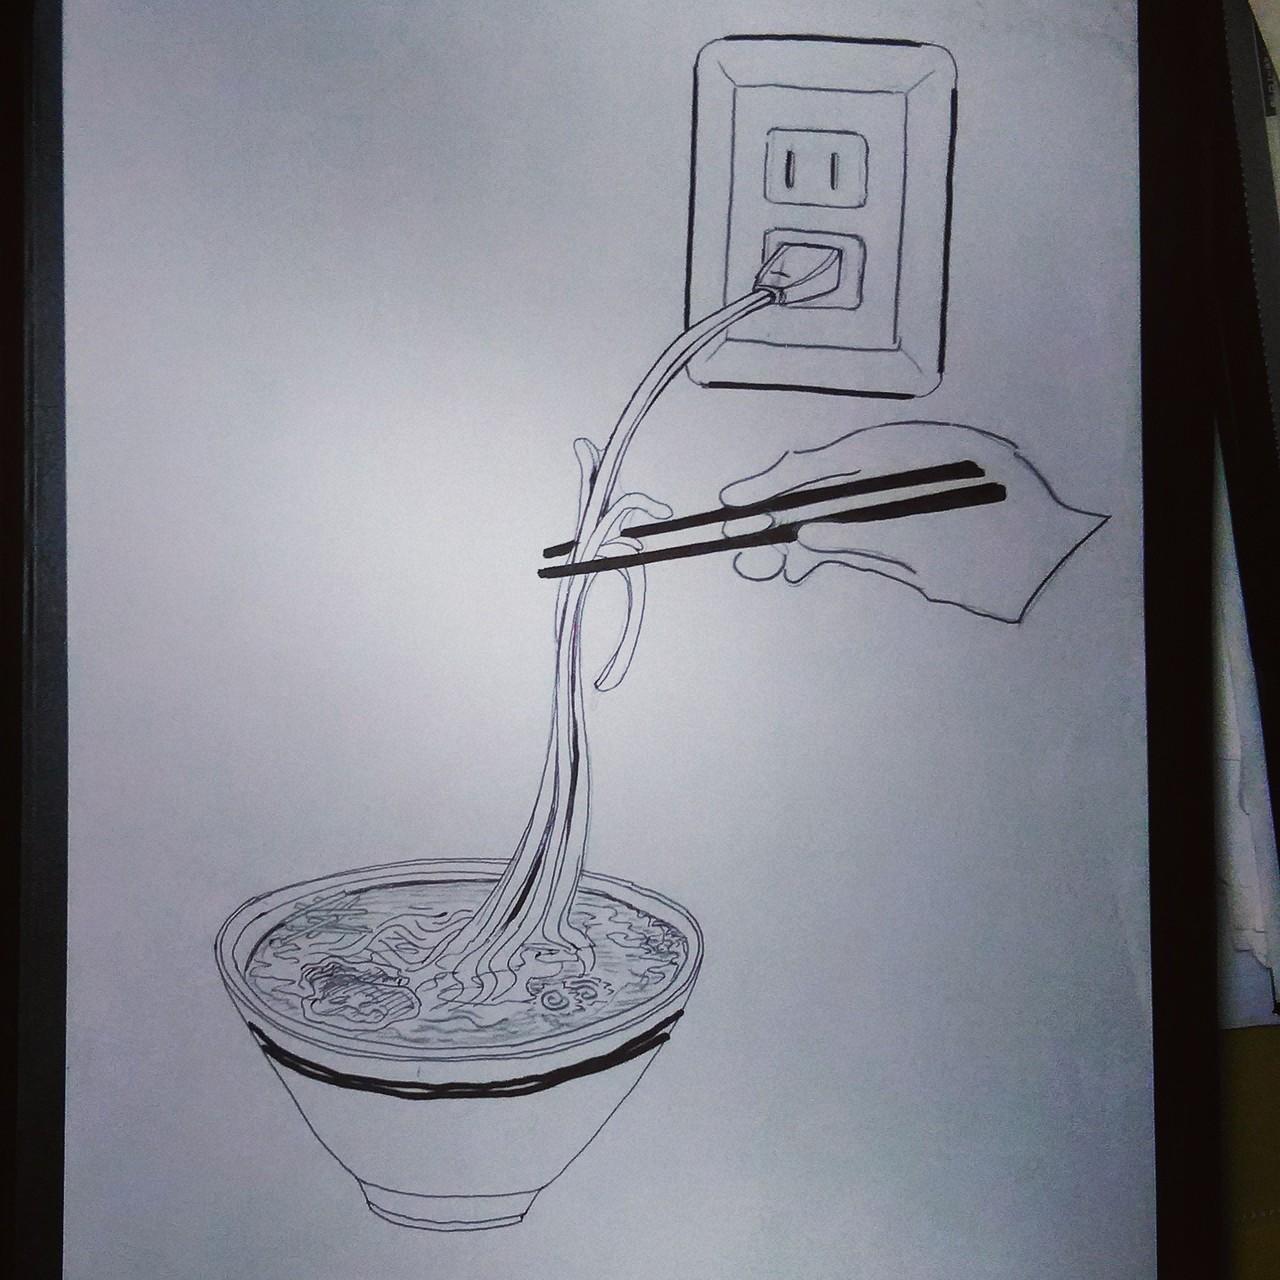 Cable Ramen / 電気ラーメン